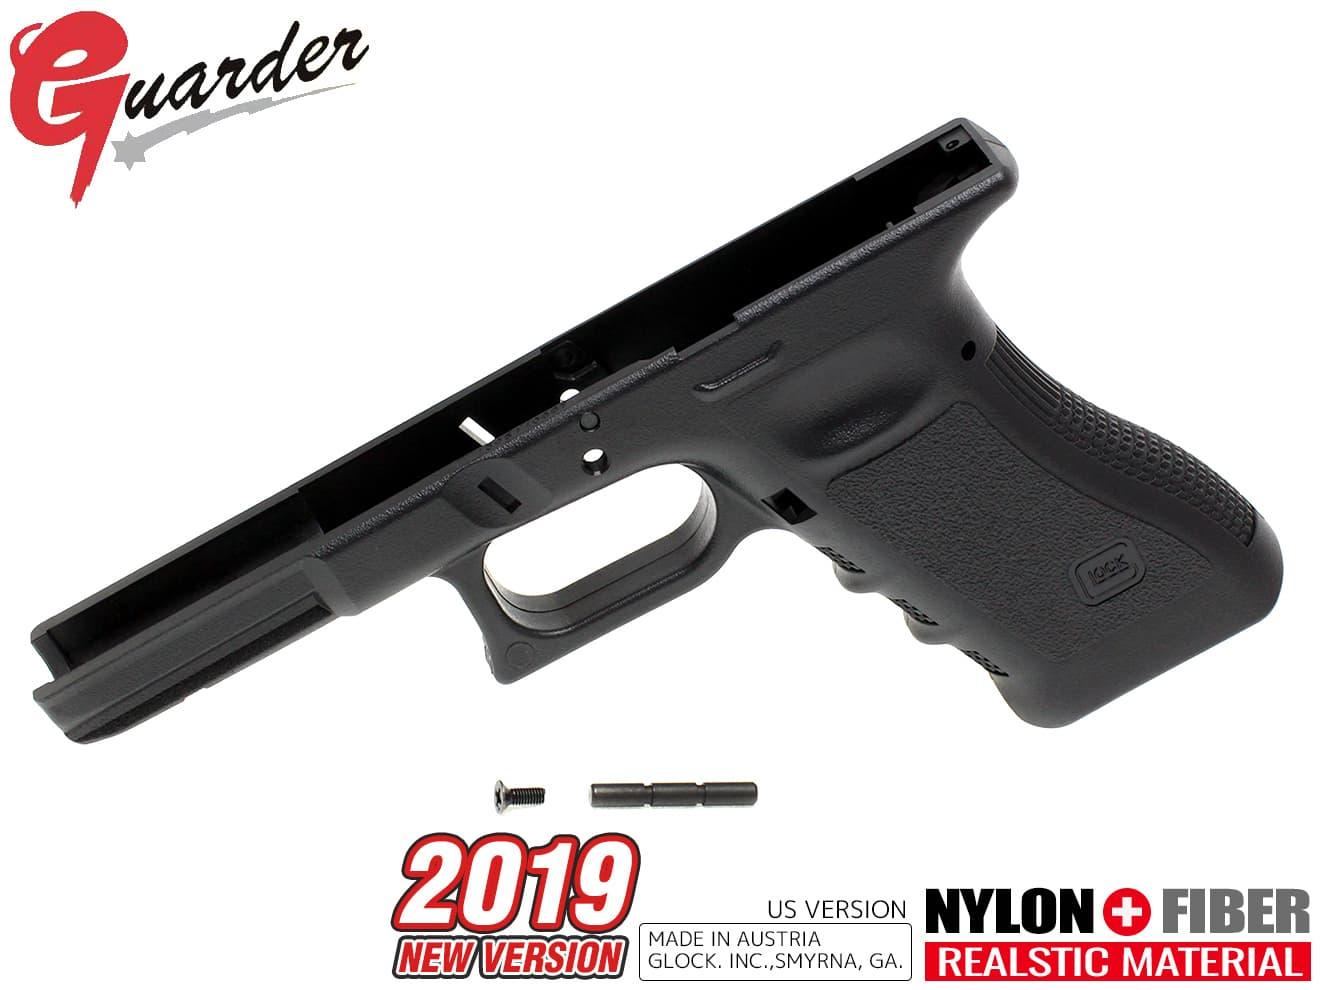 GLOCK-99(BK) ■ GUARDER girder US version 2019 original frame ★ Marui gas  etaac GLOCK Grock G17/18C